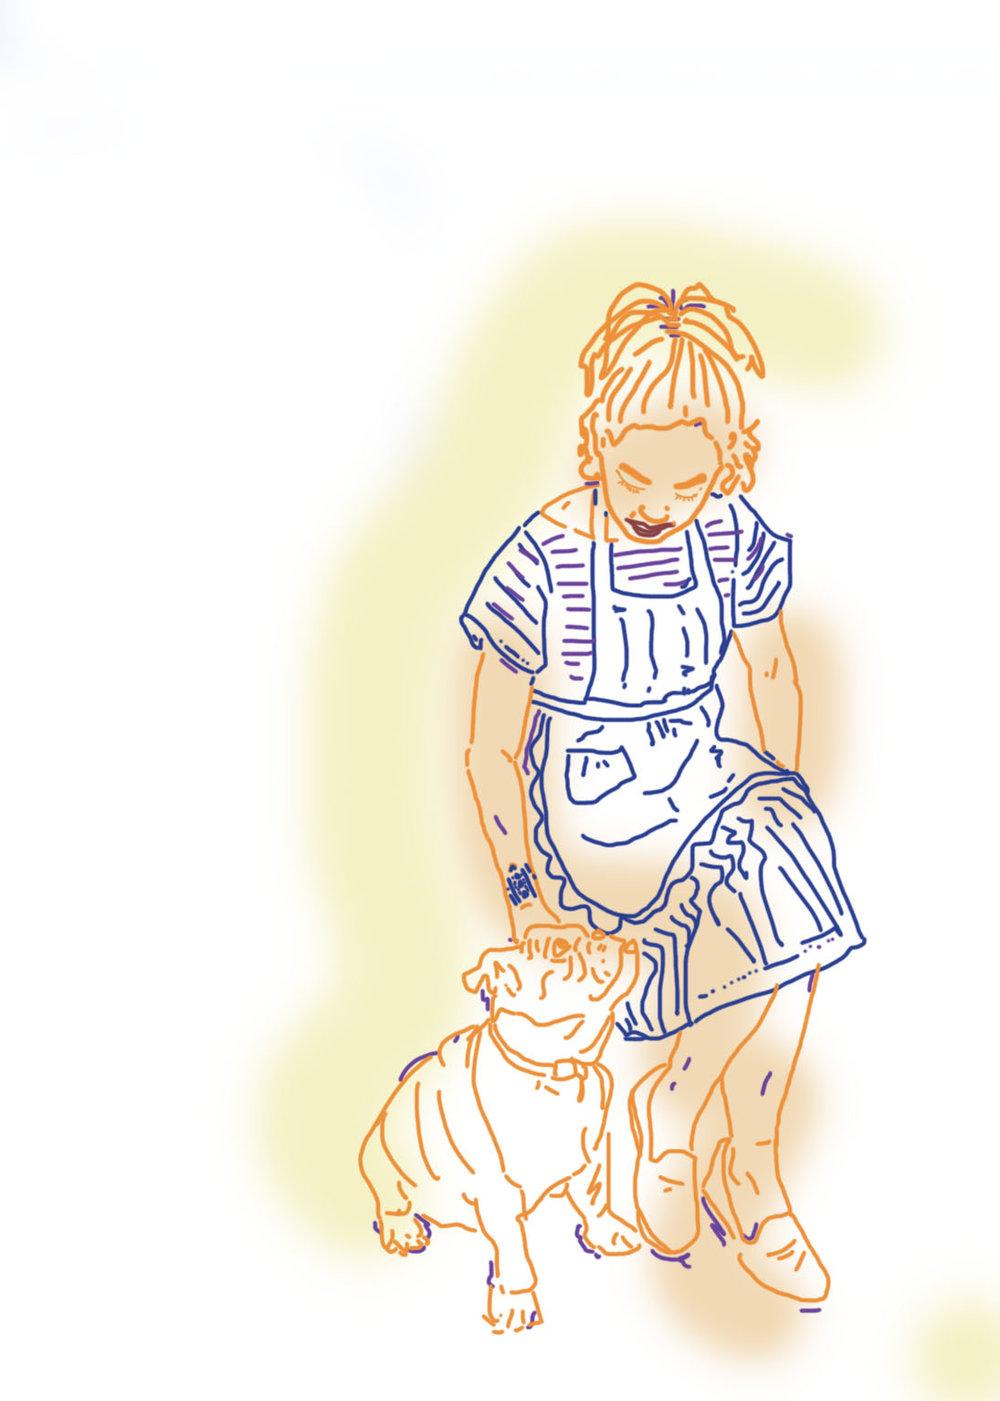 Illustration of Kim Davalos by Kenta Thomas